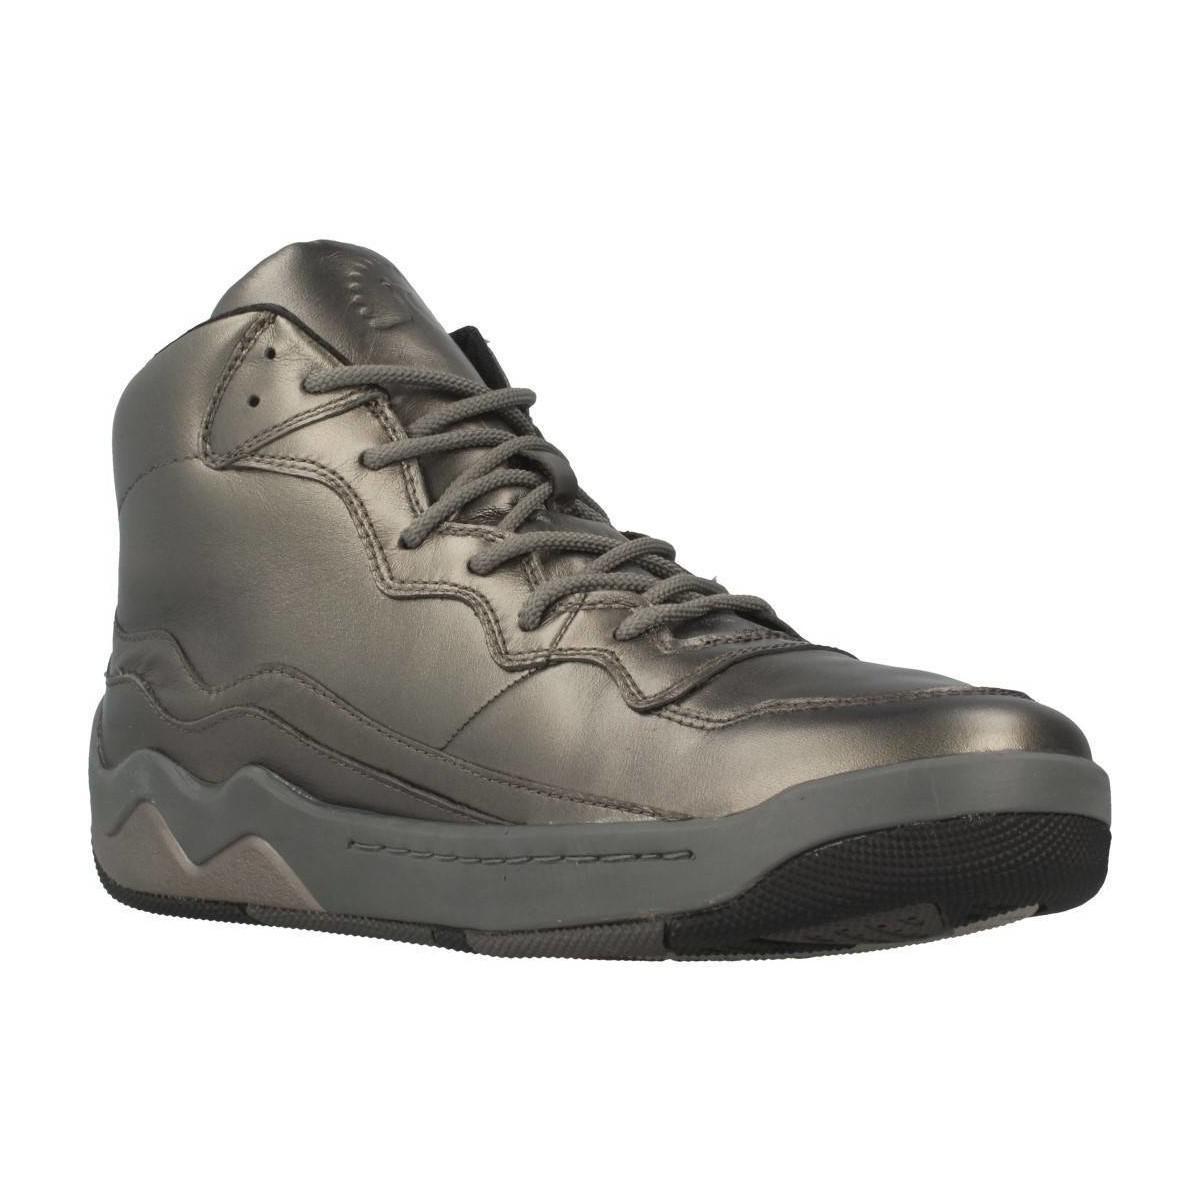 854b9e403aa Lyst - U WIGGLE hommes Chaussures en Autres Geox pour homme - 37 ...